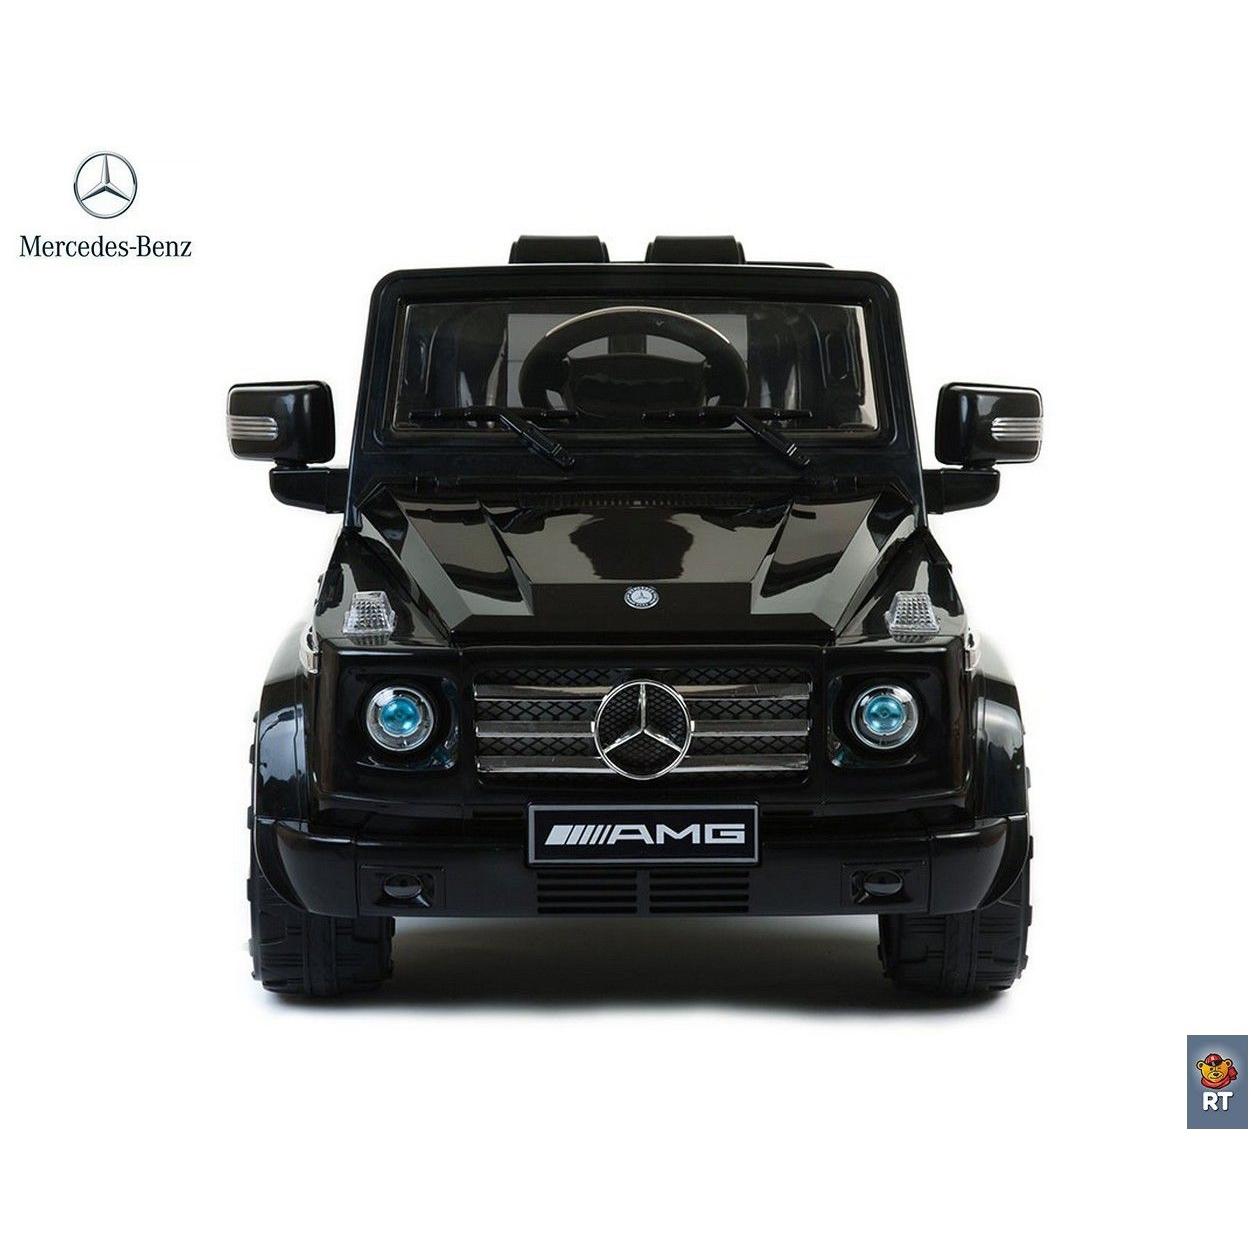 ������������� RT Mercedes-Benz AMG NEW Version Black